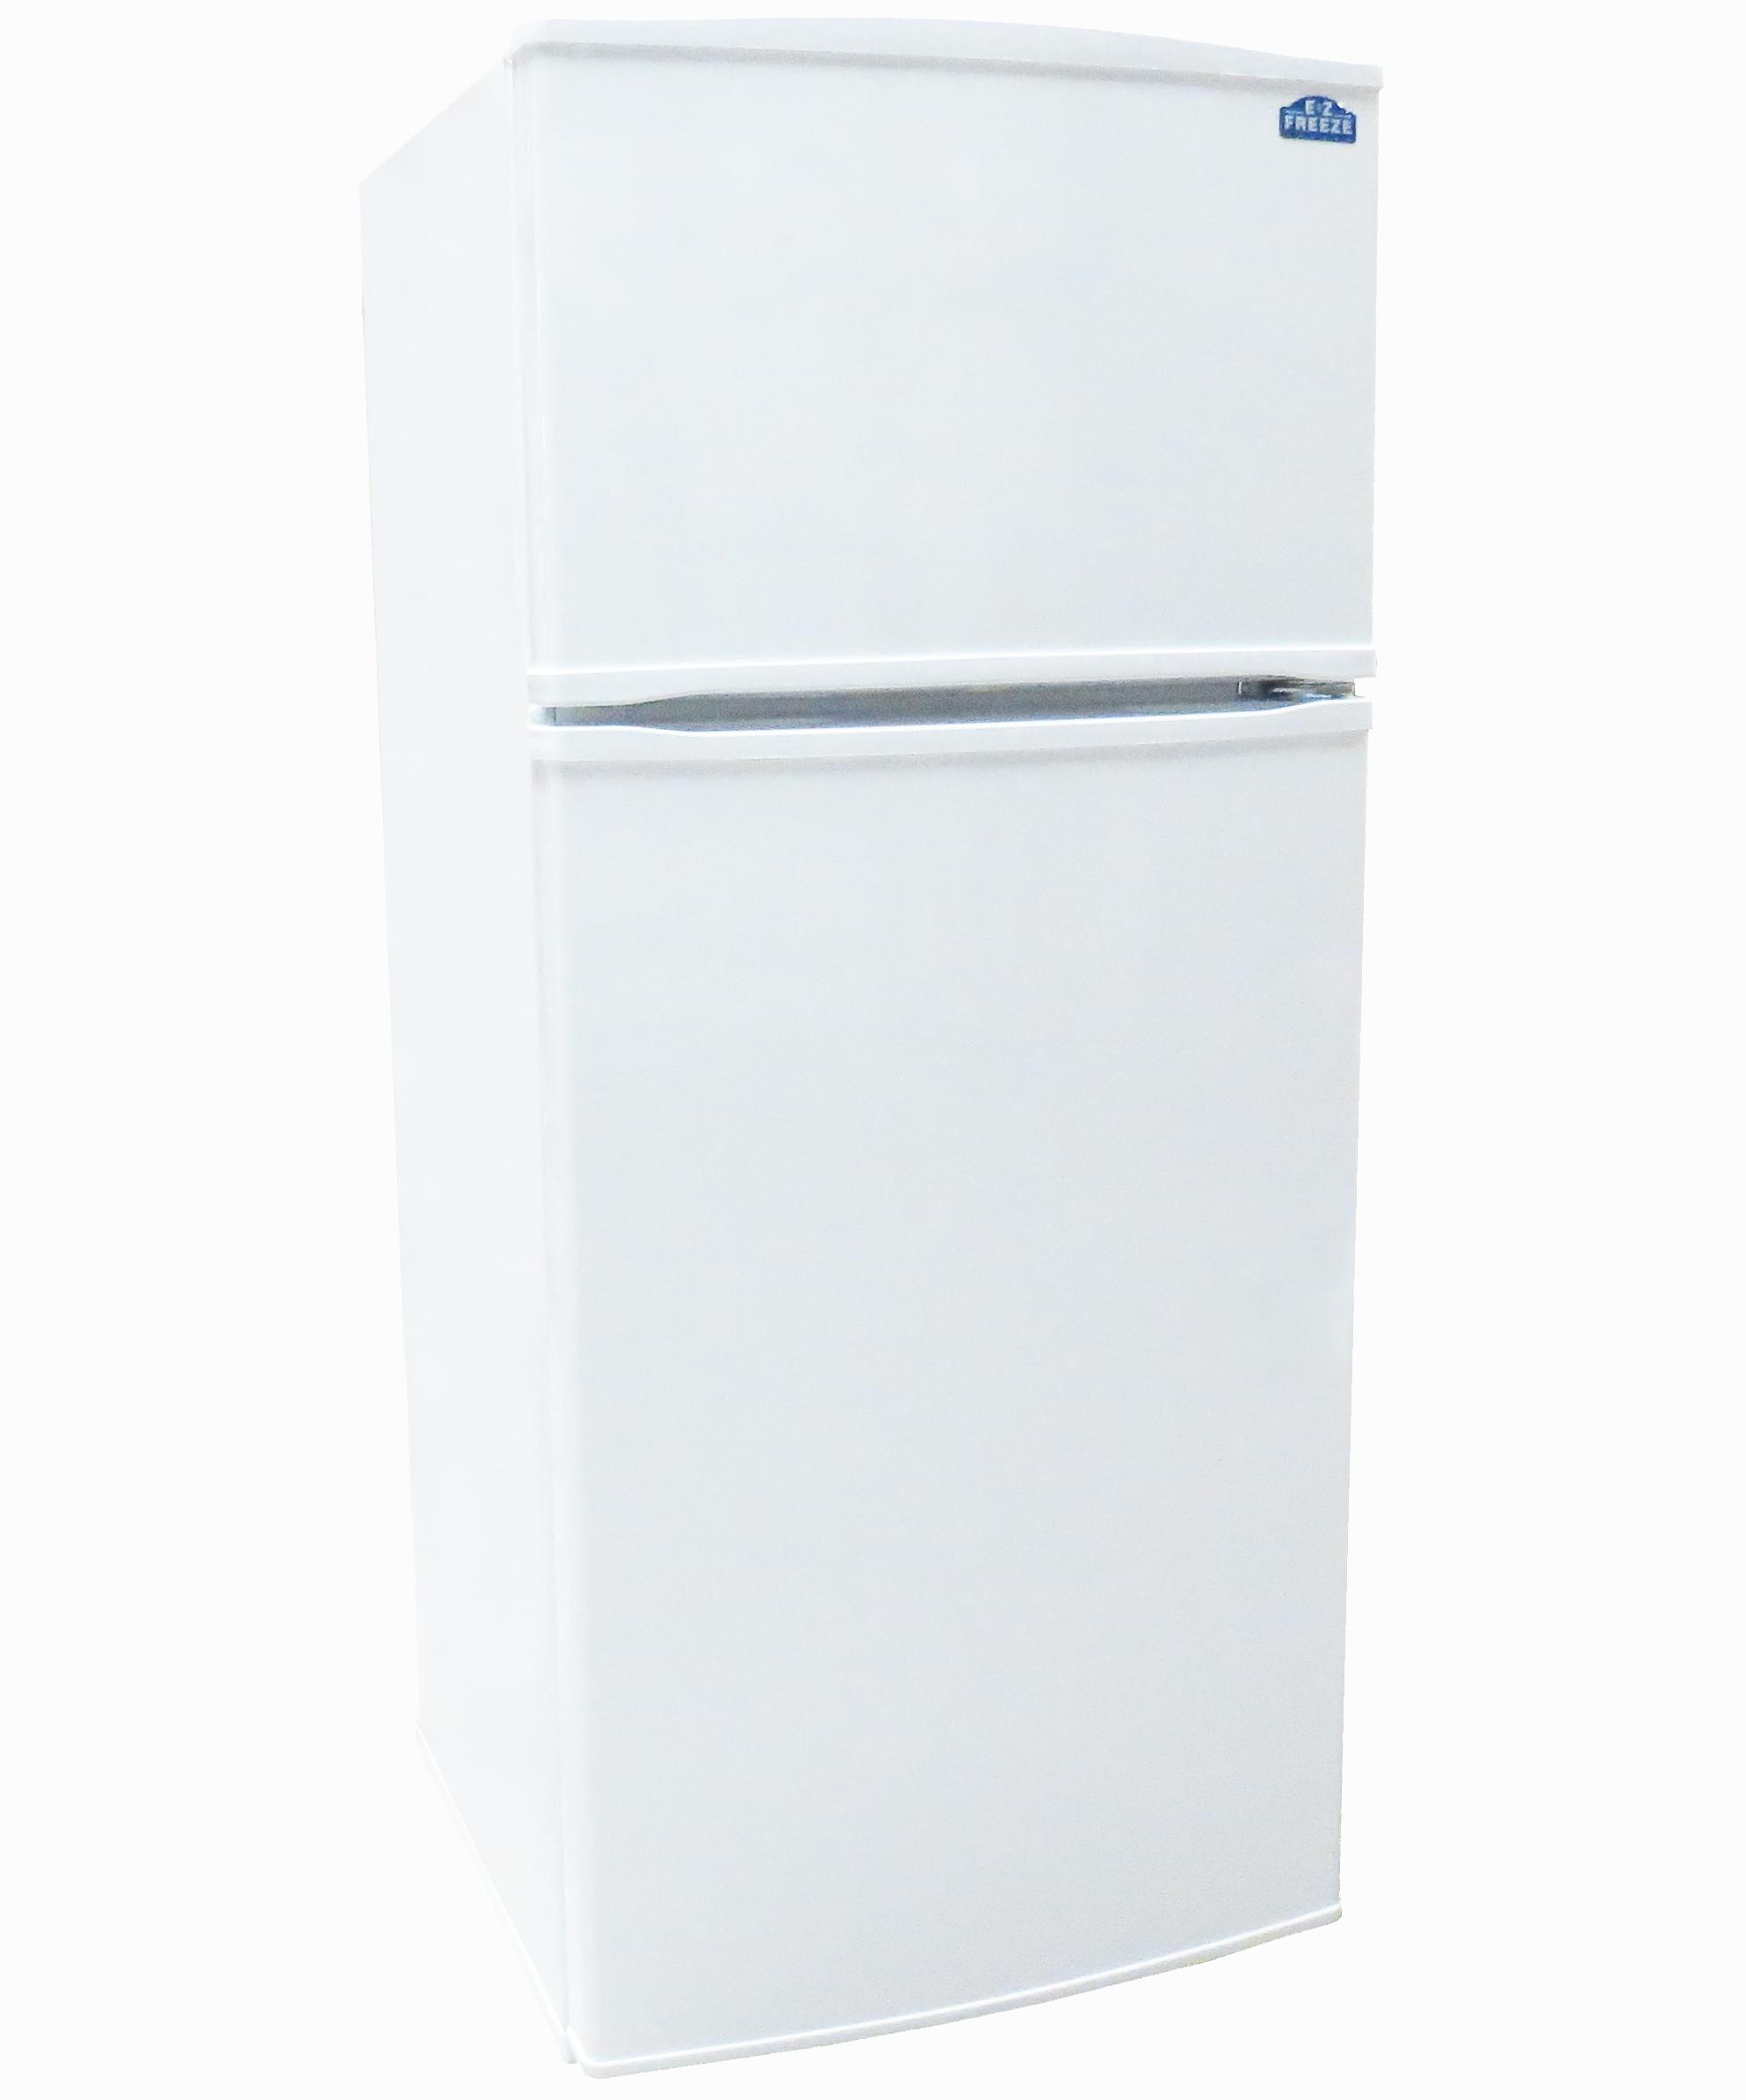 Propane Refrigerators 2021